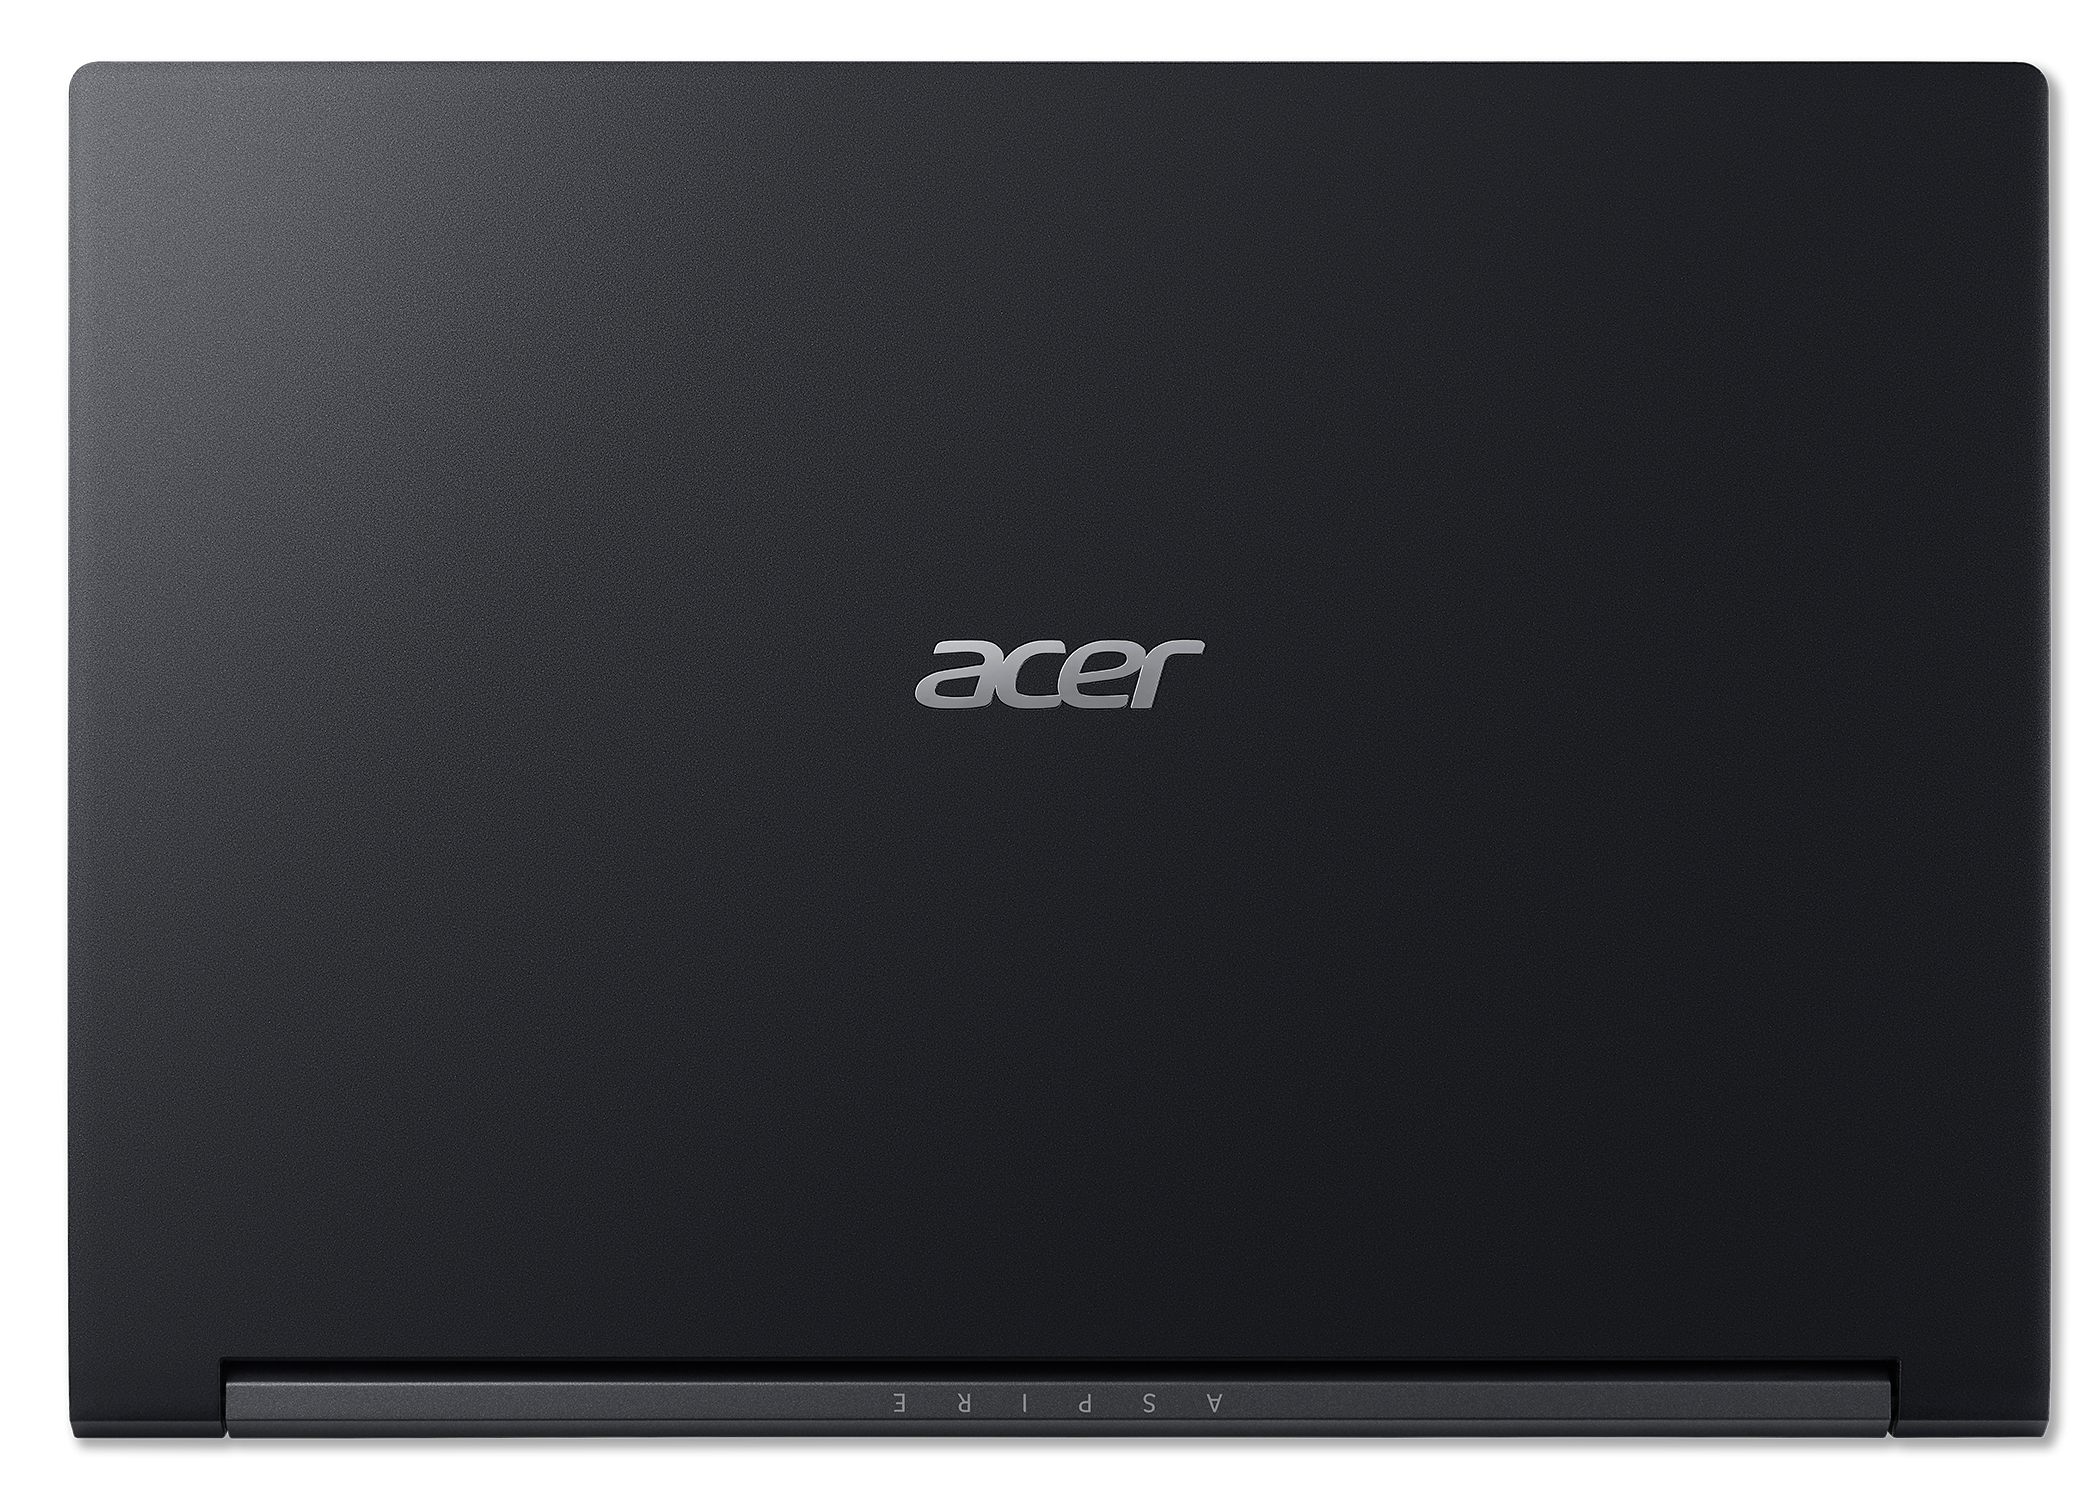 Acer Aspire A715-75G-74H3. - 15.6i FHD IPS ComfyView - Intel Core i7-10750H - 16GB DDR4 - 1TB PCIe NVMe SSD - GeForce GTX 1650Ti - Intel Wi-Fi 6 AX 200 - Win10Home - QWERTY